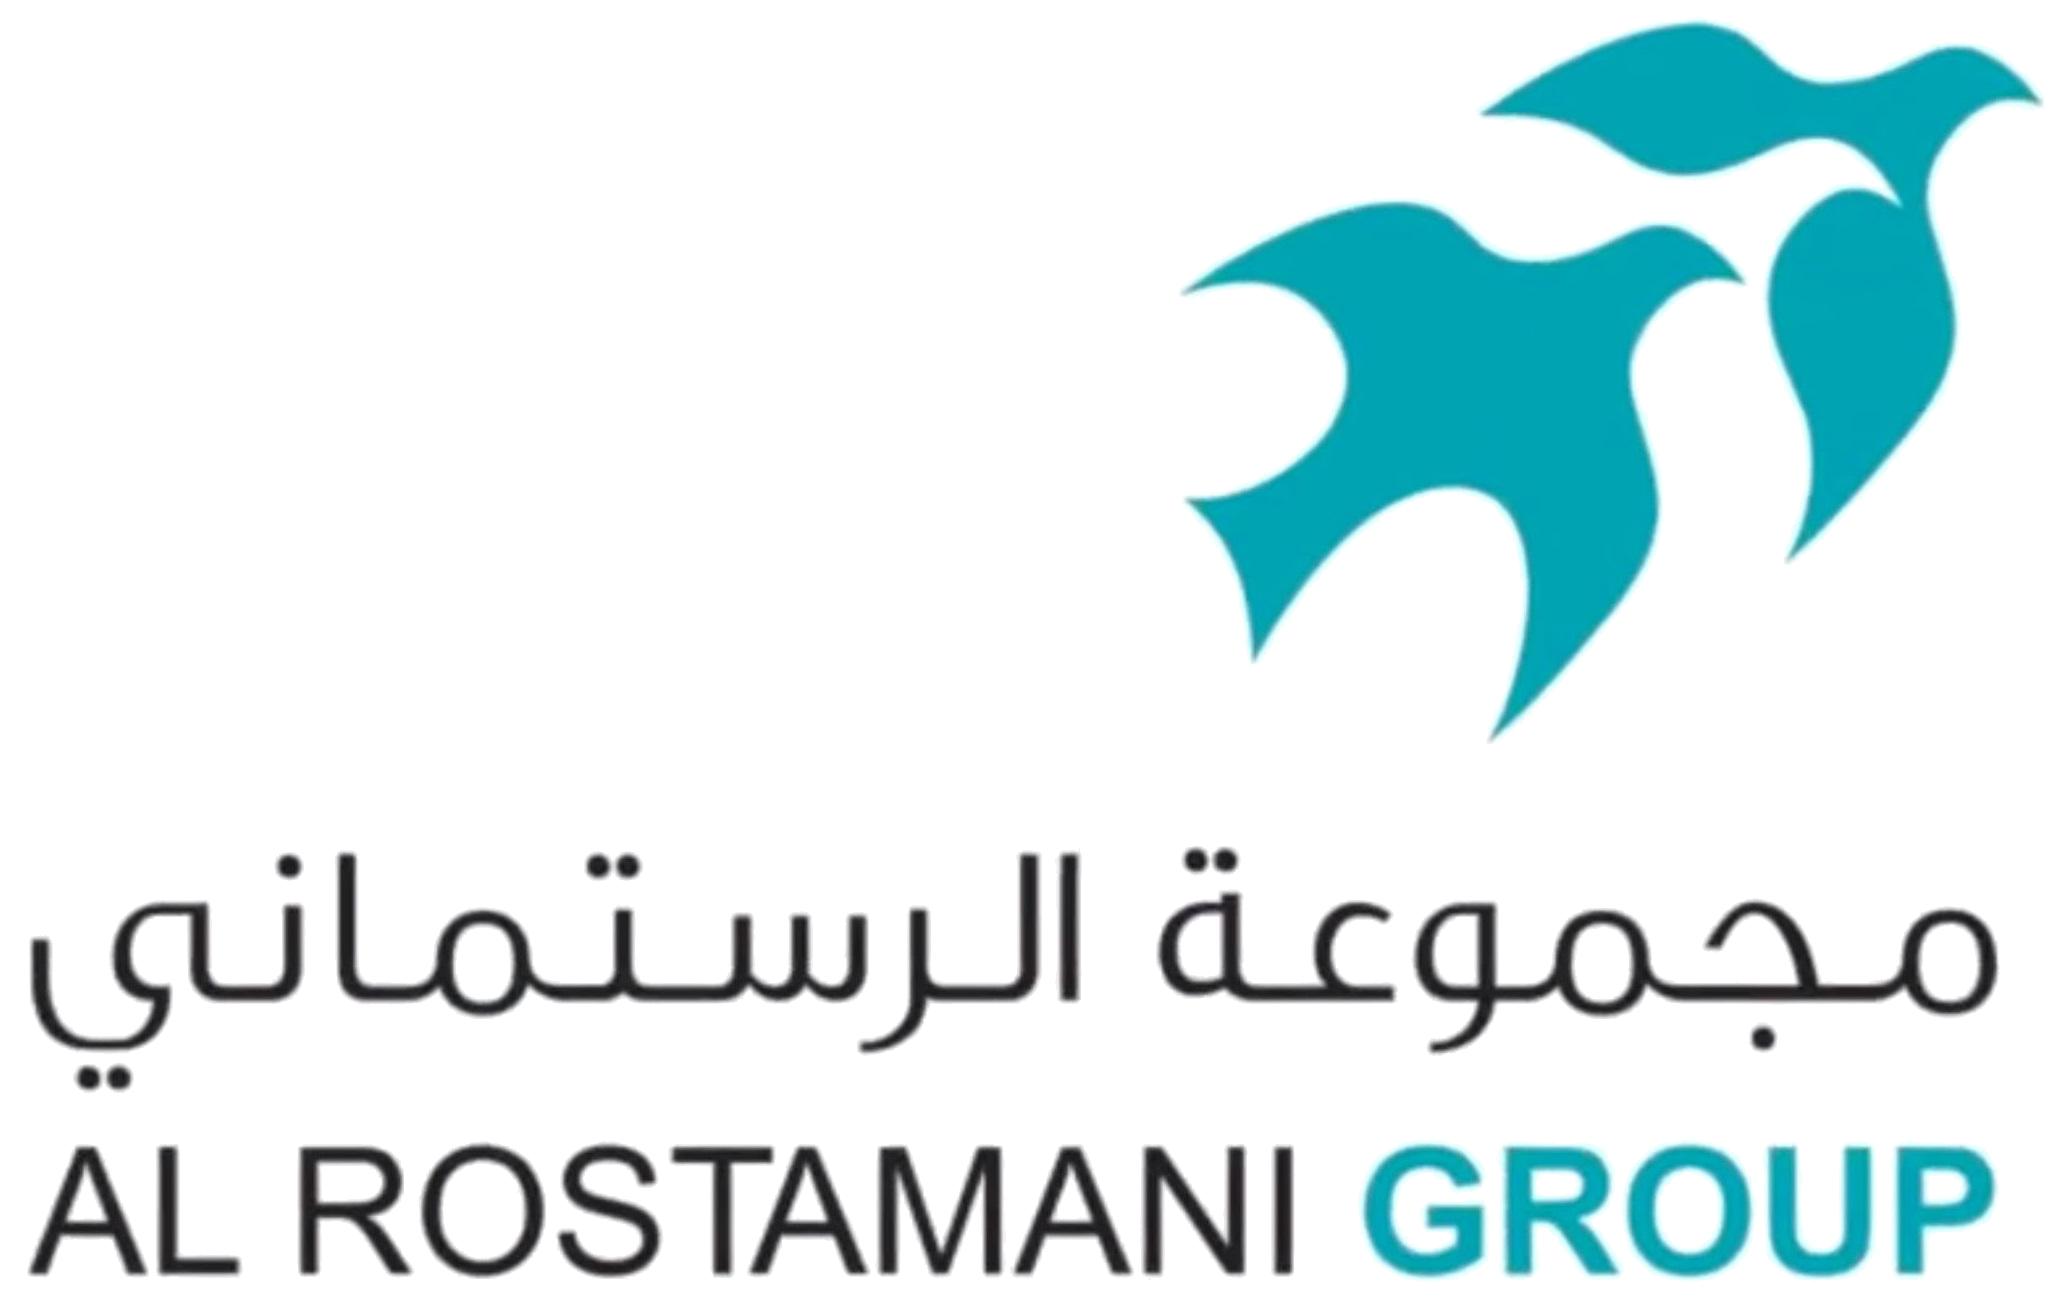 Al Rostamani Group